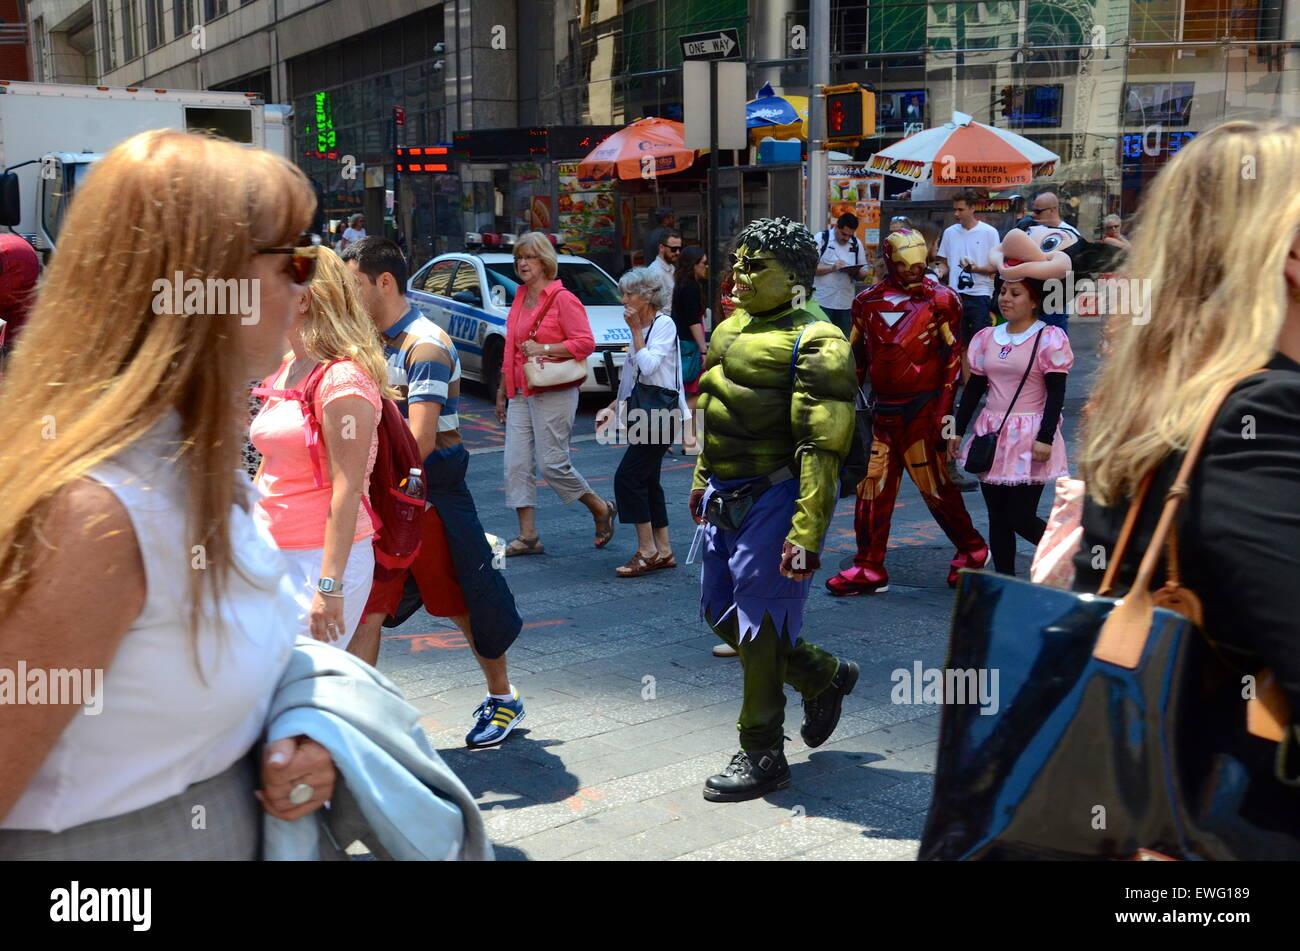 the hulk costumed man times sqaure street new york crossing - Stock Image